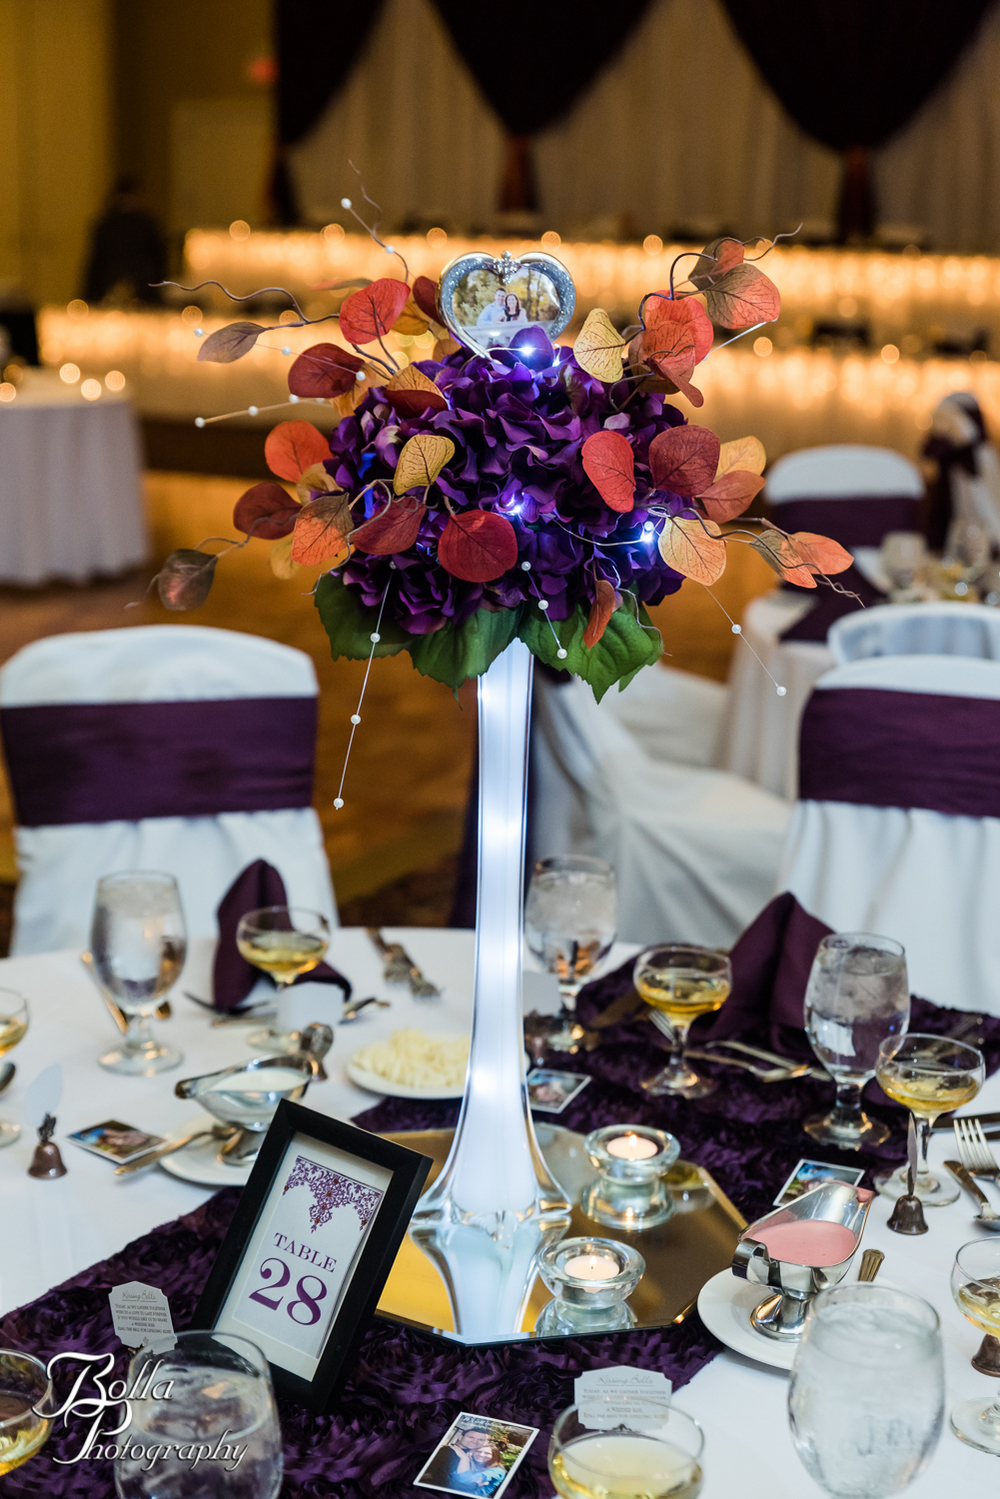 Bolla_Photography_St_Louis_wedding_photographer-0381.jpg